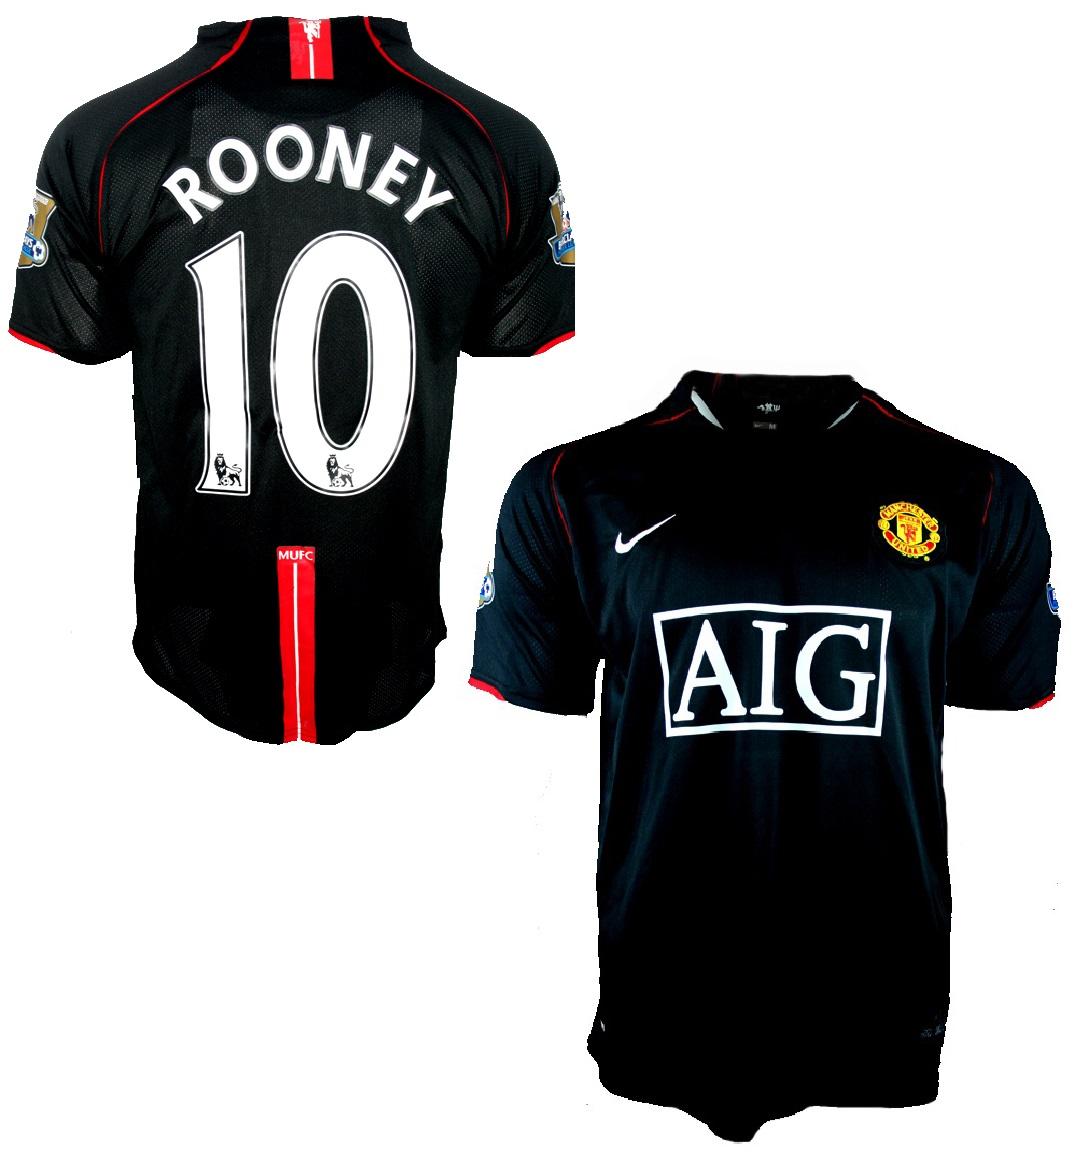 69adc120dab Nike Manchester United jersey 10 Wayne Rooney 2007 08 AIG black men s M